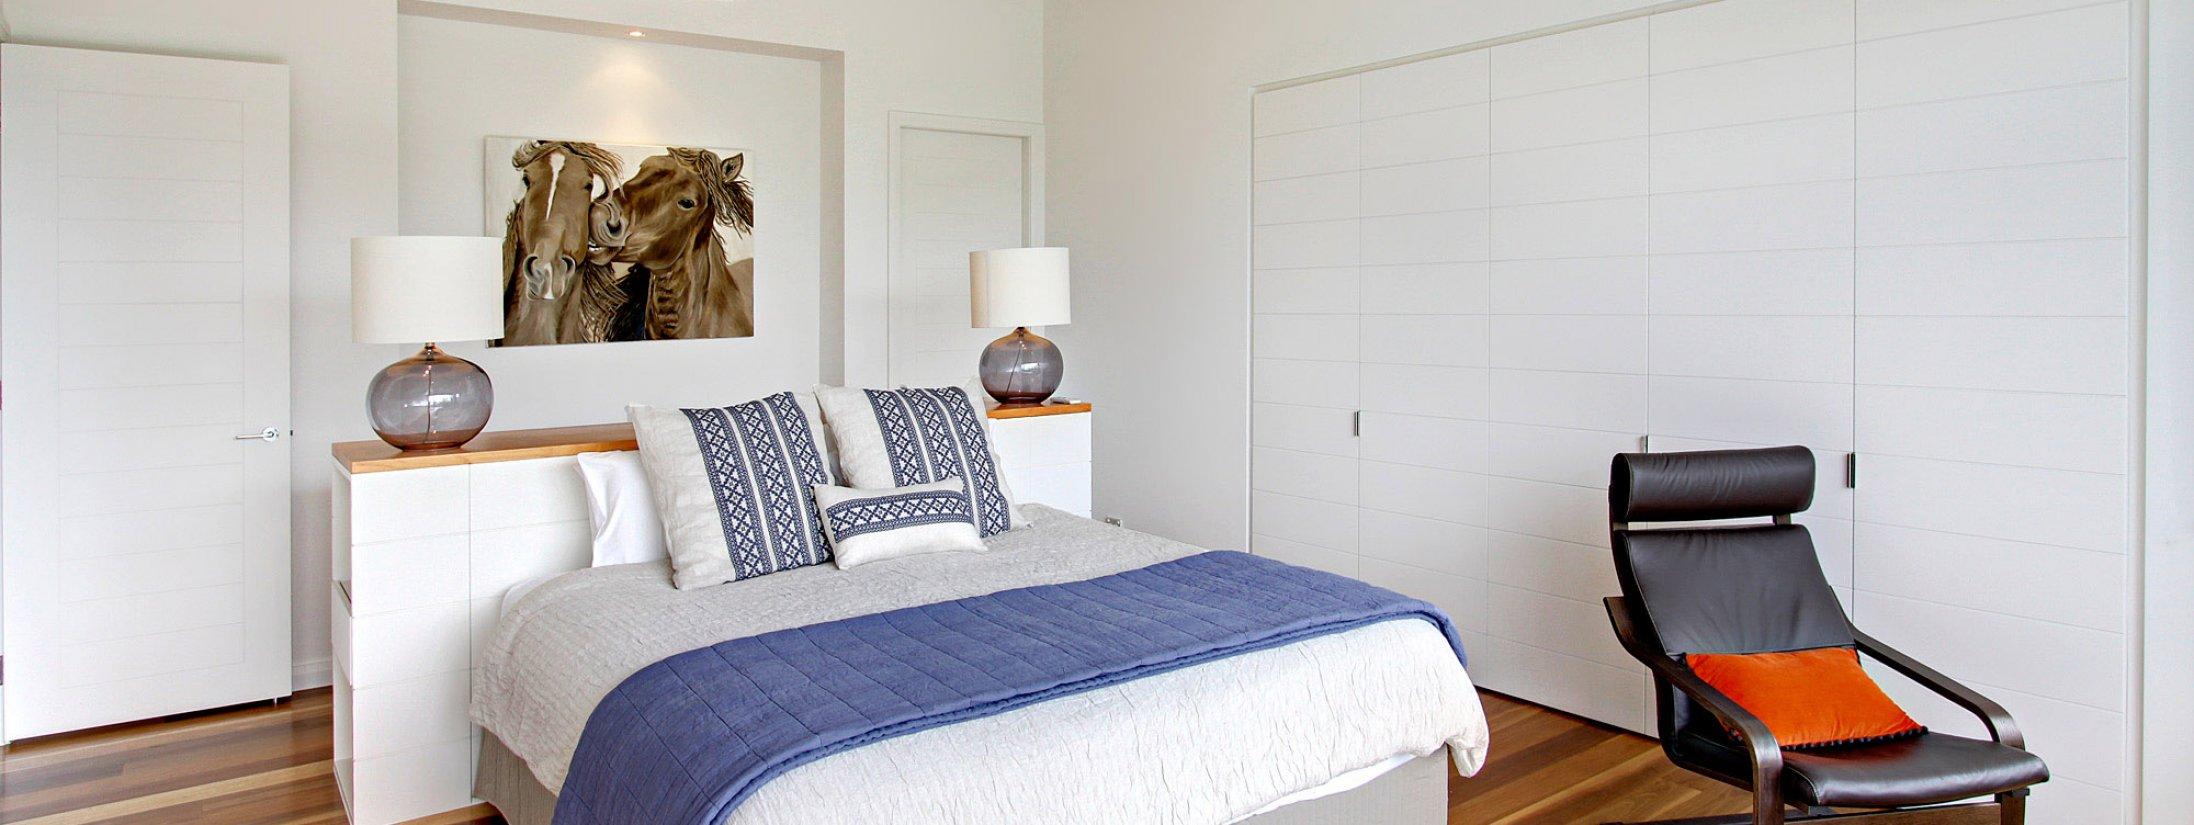 Ocean View at Kiah - Byron Bay - Bedroom 1 Master